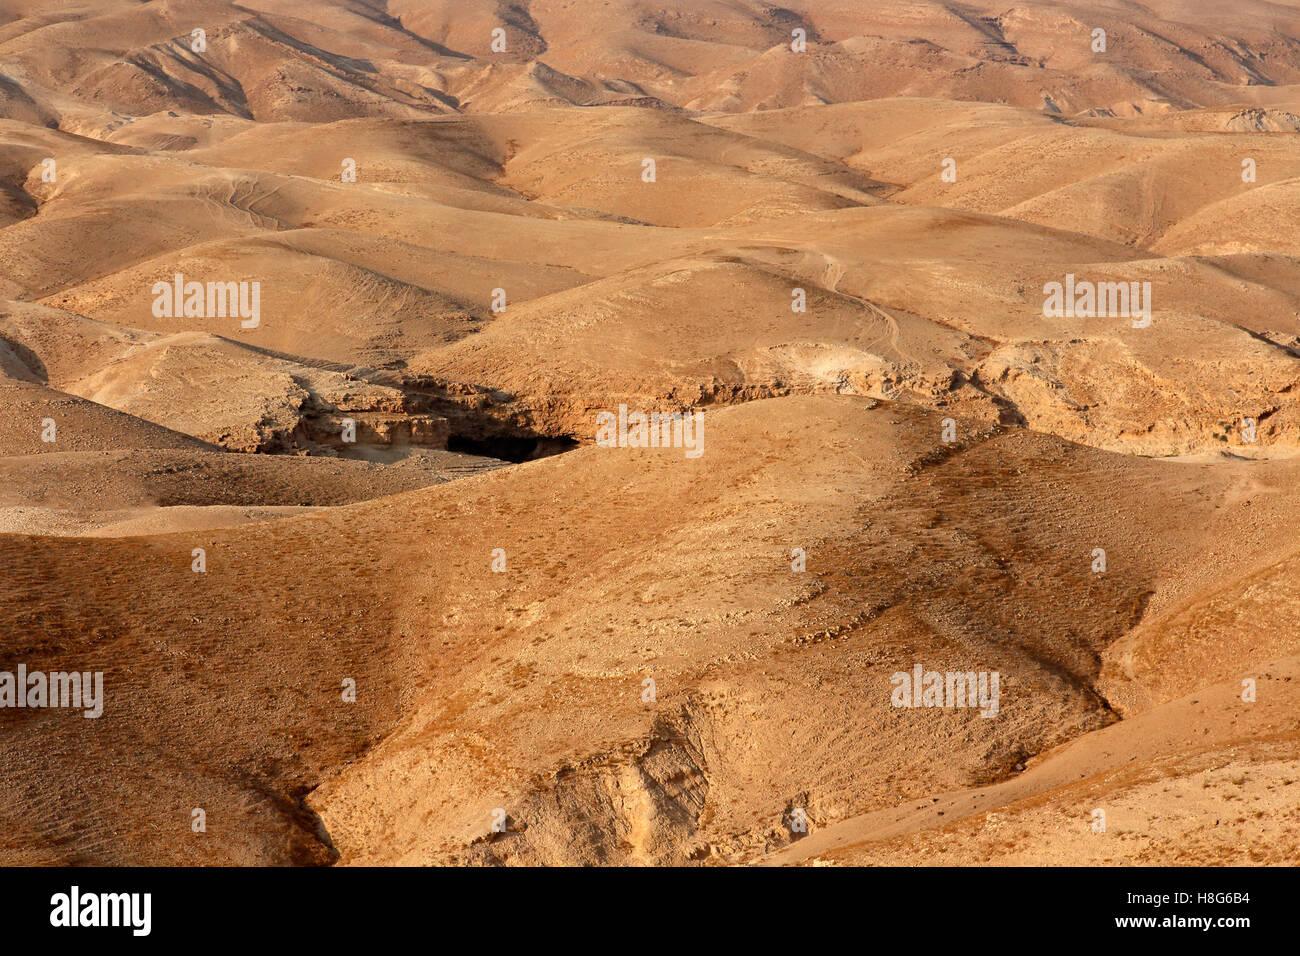 Mountainous Judean desert landscape near Jericho, Israel - Stock Image